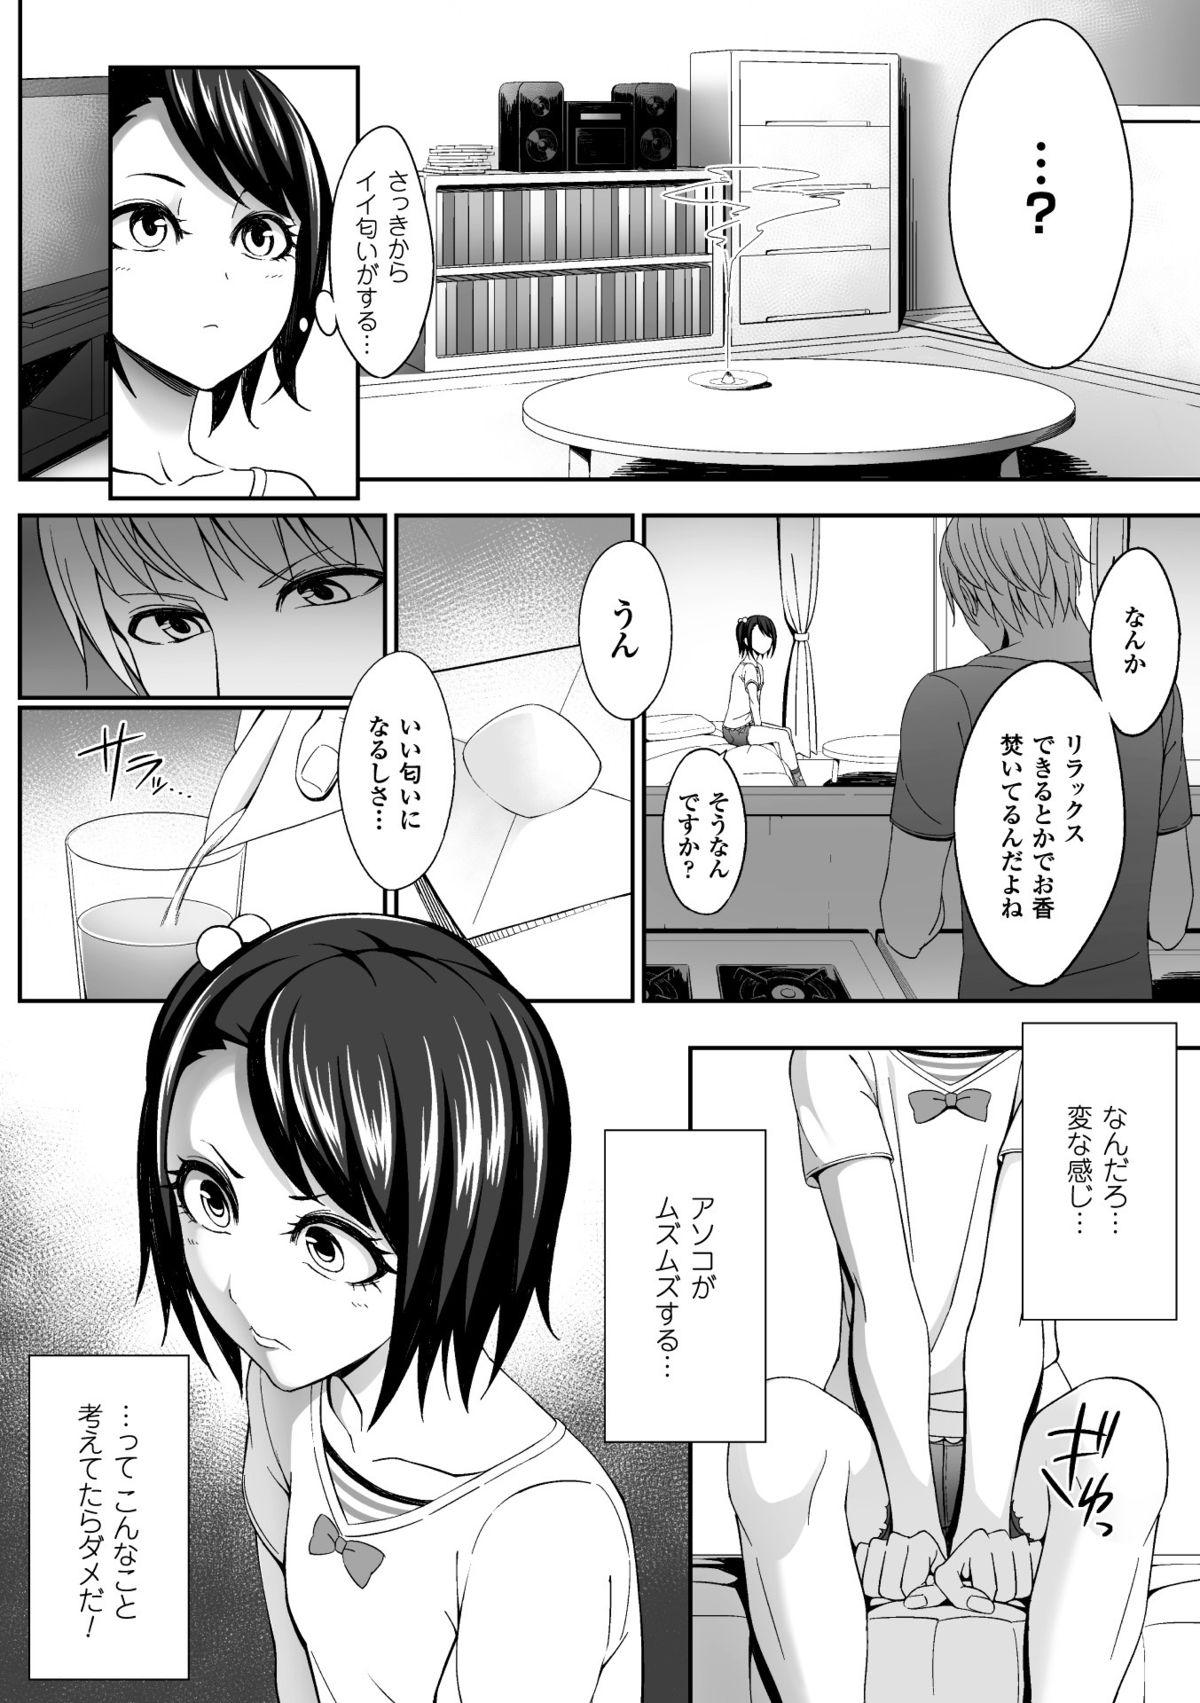 2D Comic Magazine Kusurizuke SEX de Keiren Ahegao Acme! Vol. 2 4